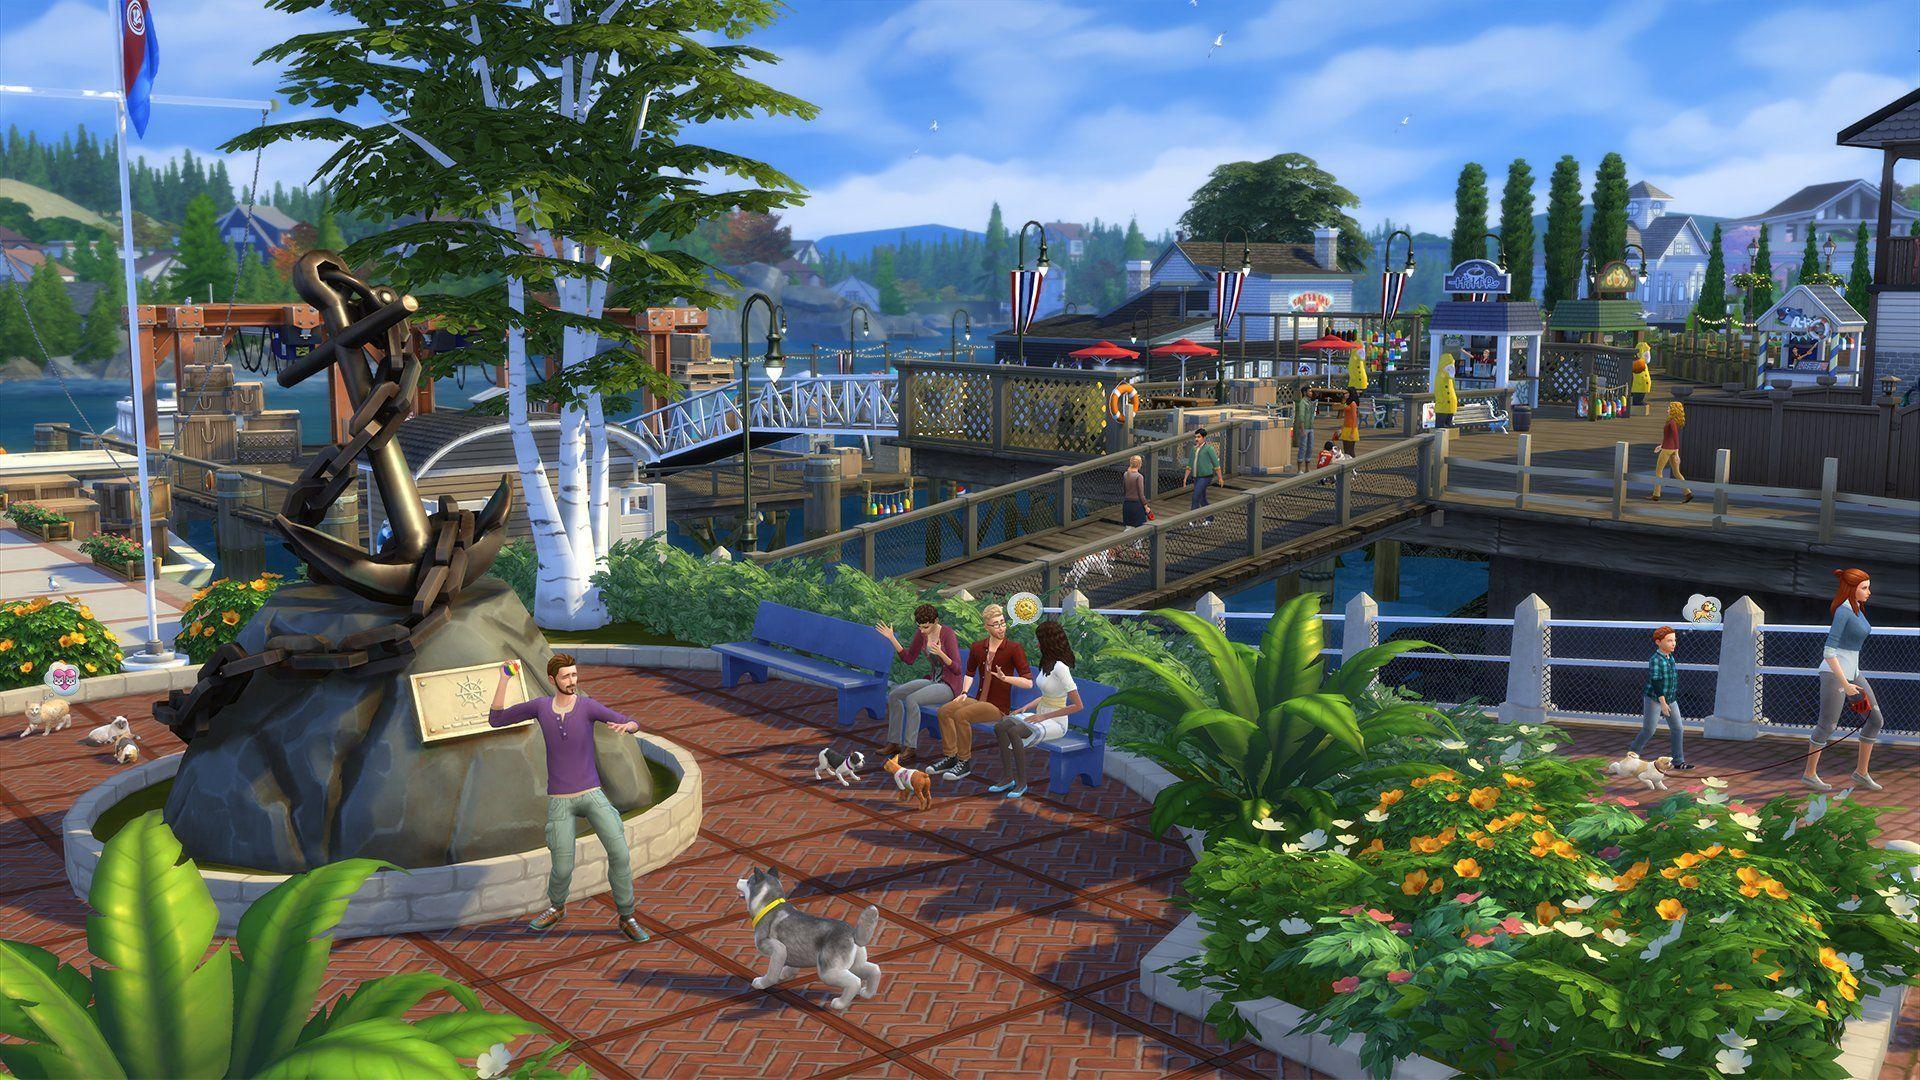 Amazon Com The Sims 4 Cats Dogs Video Games Sims 4 Sims Singapore Garden